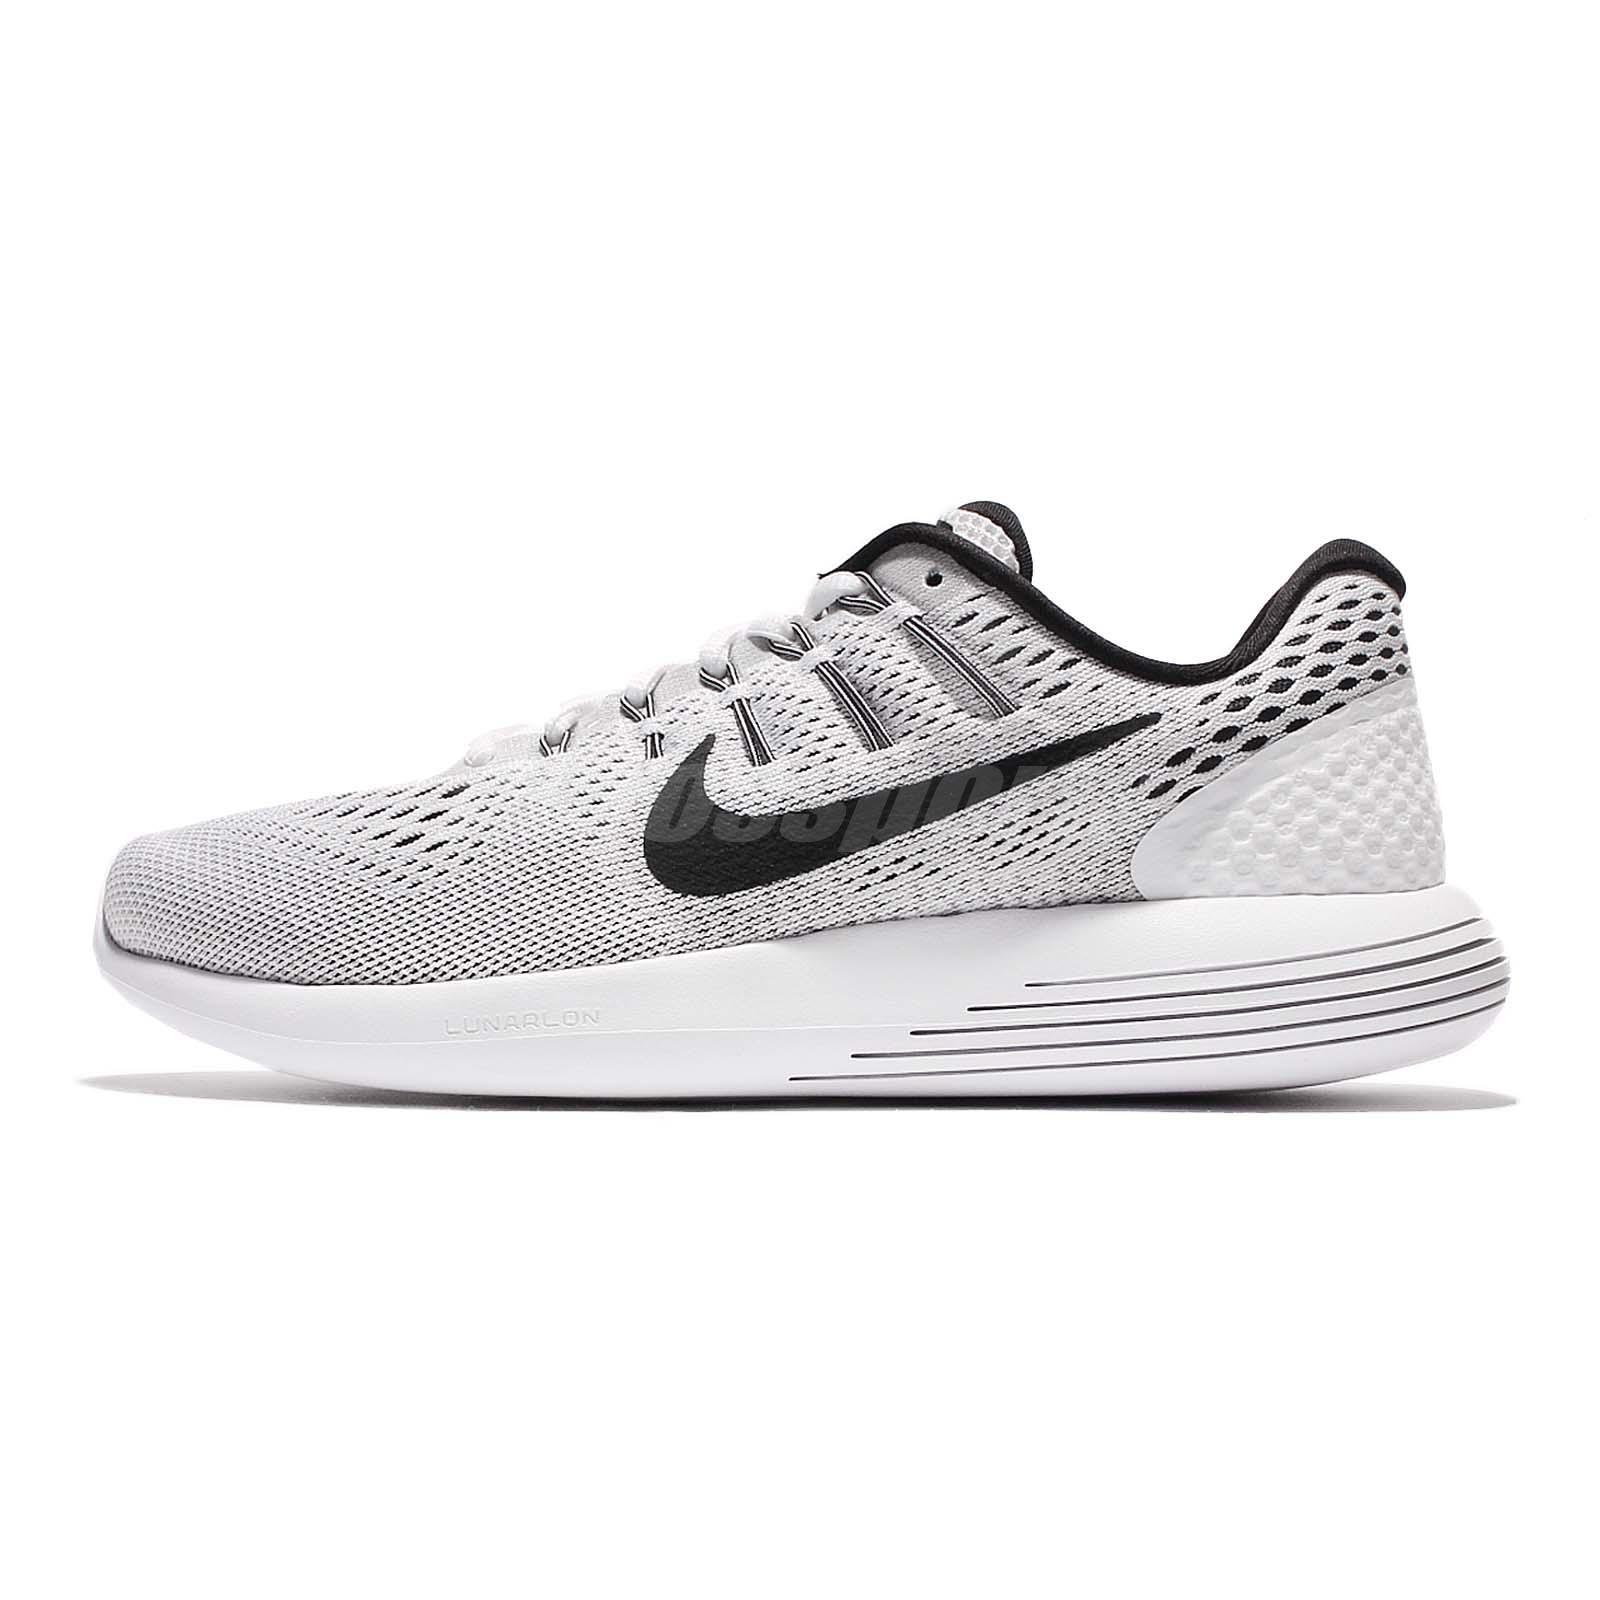 Nike running lunarlon shoes